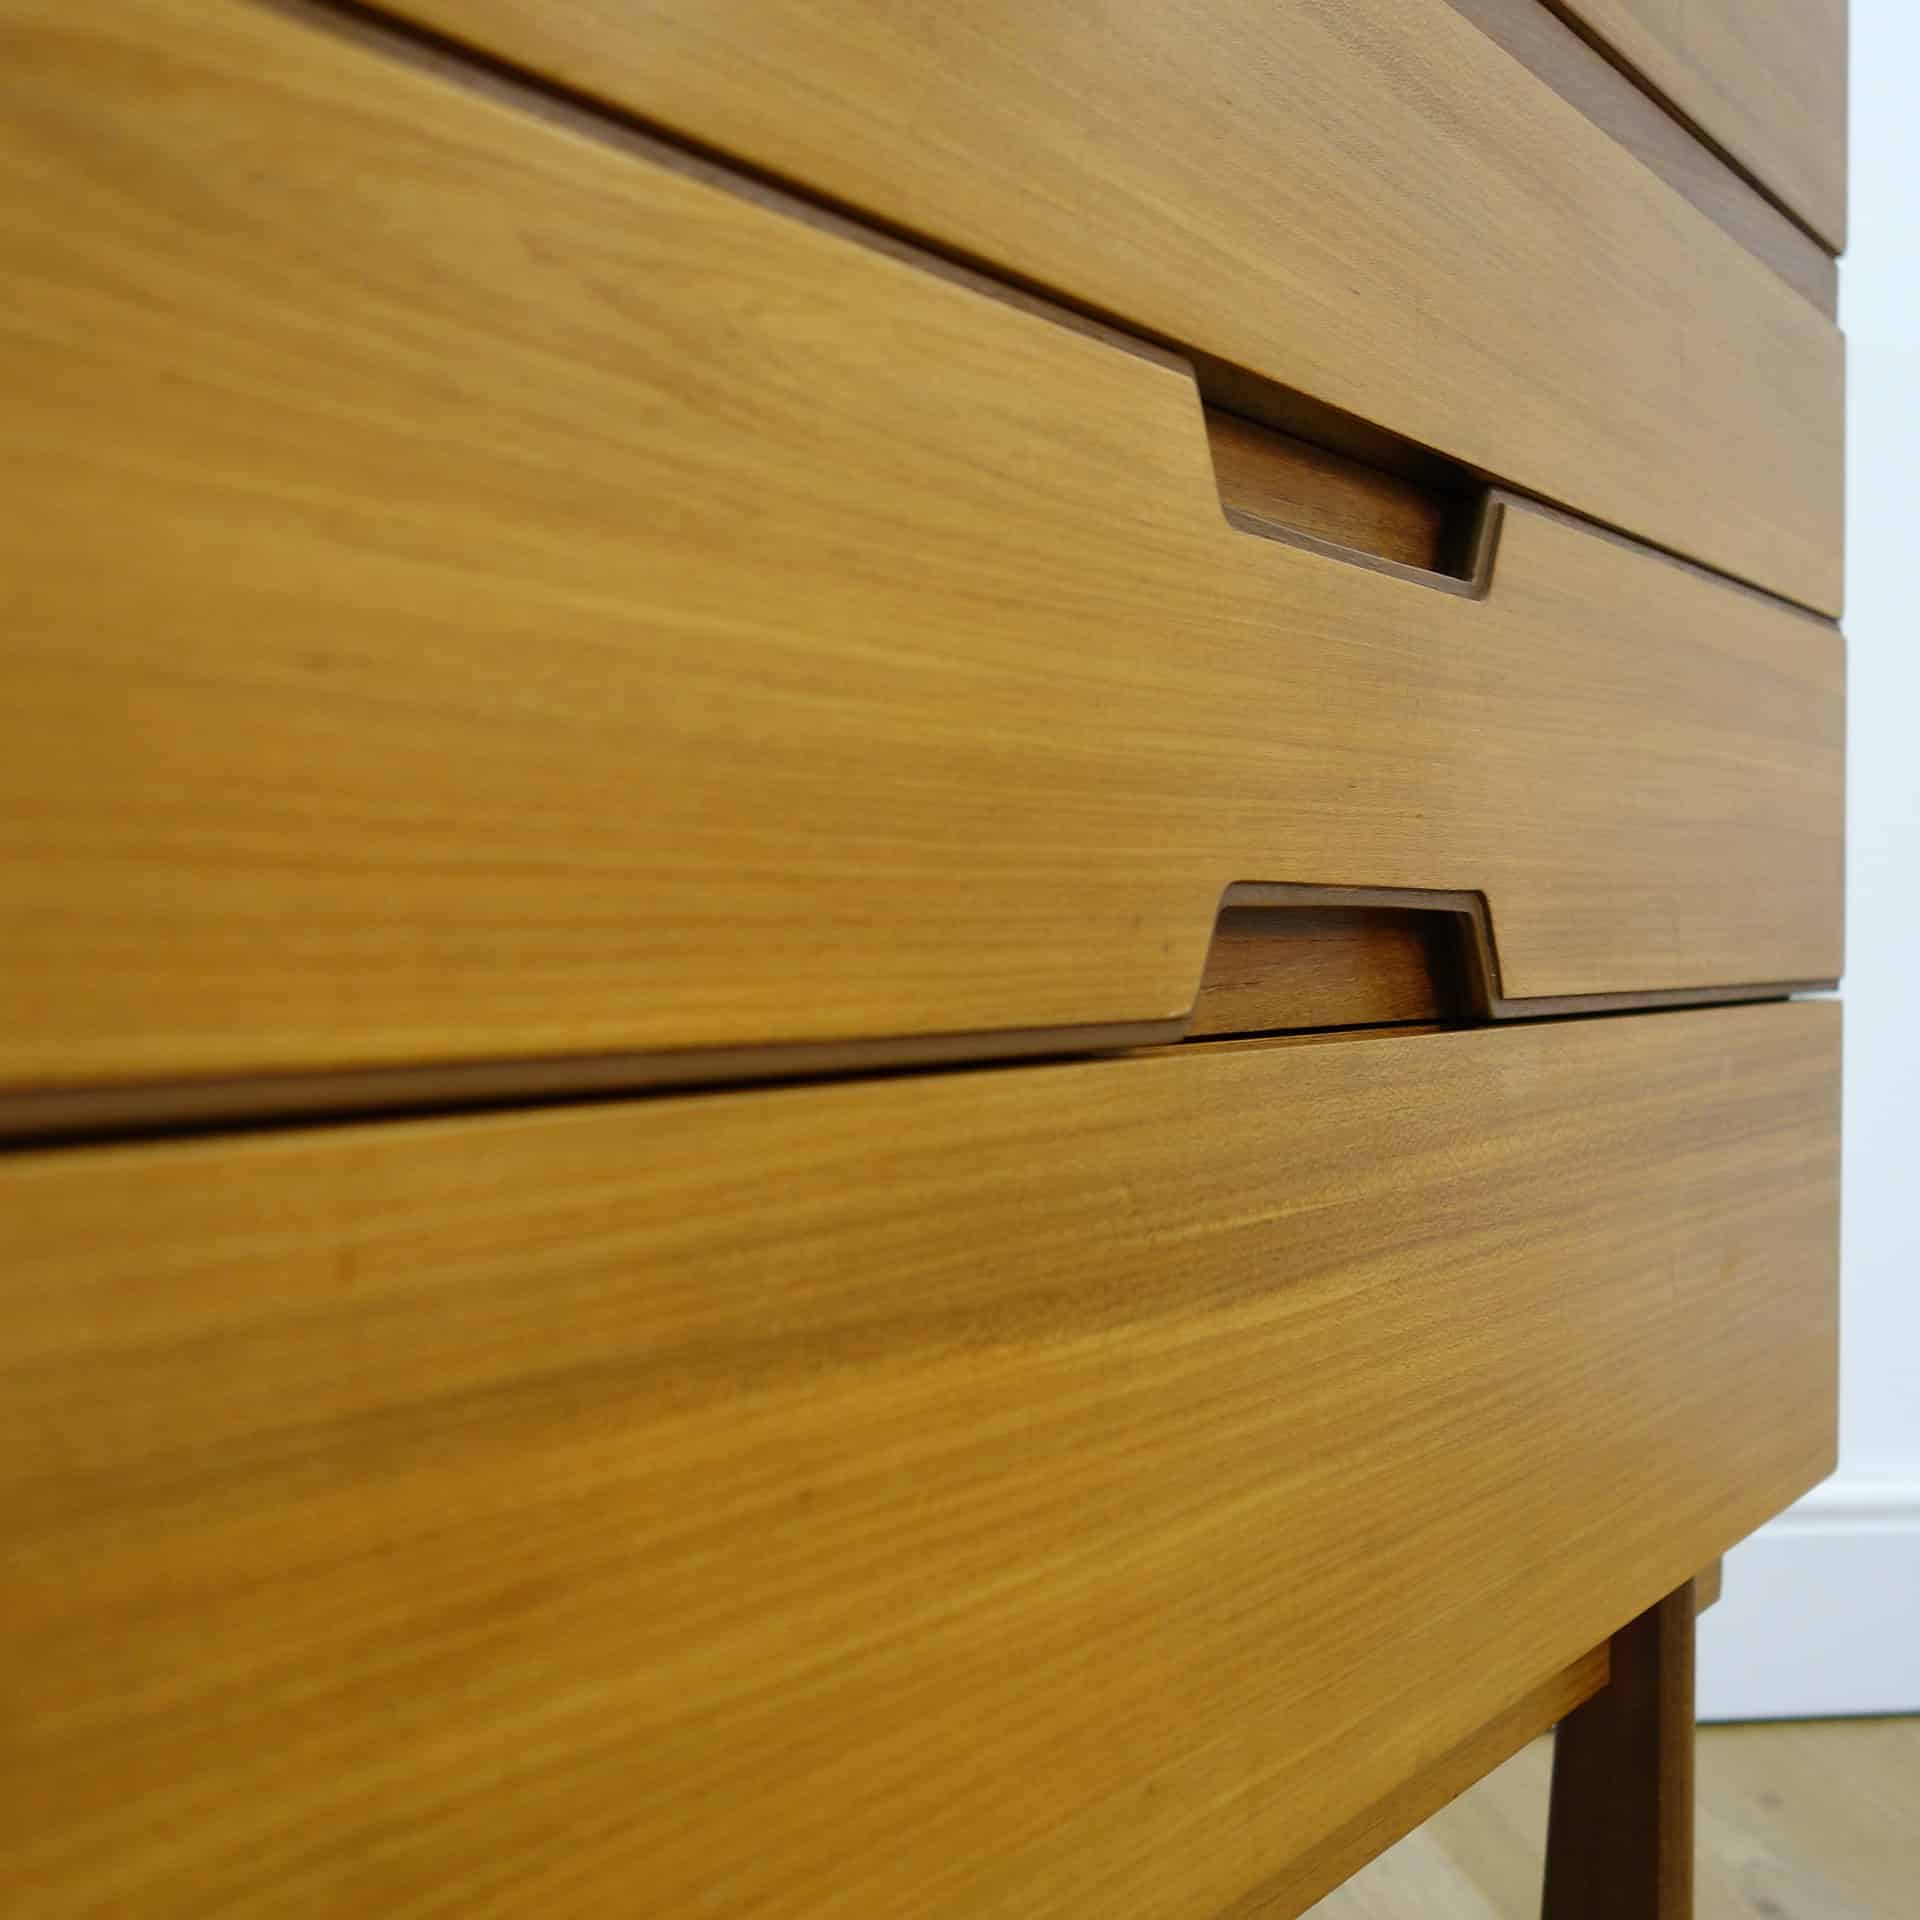 Tall Q range teak chest of drawers by Uniflex